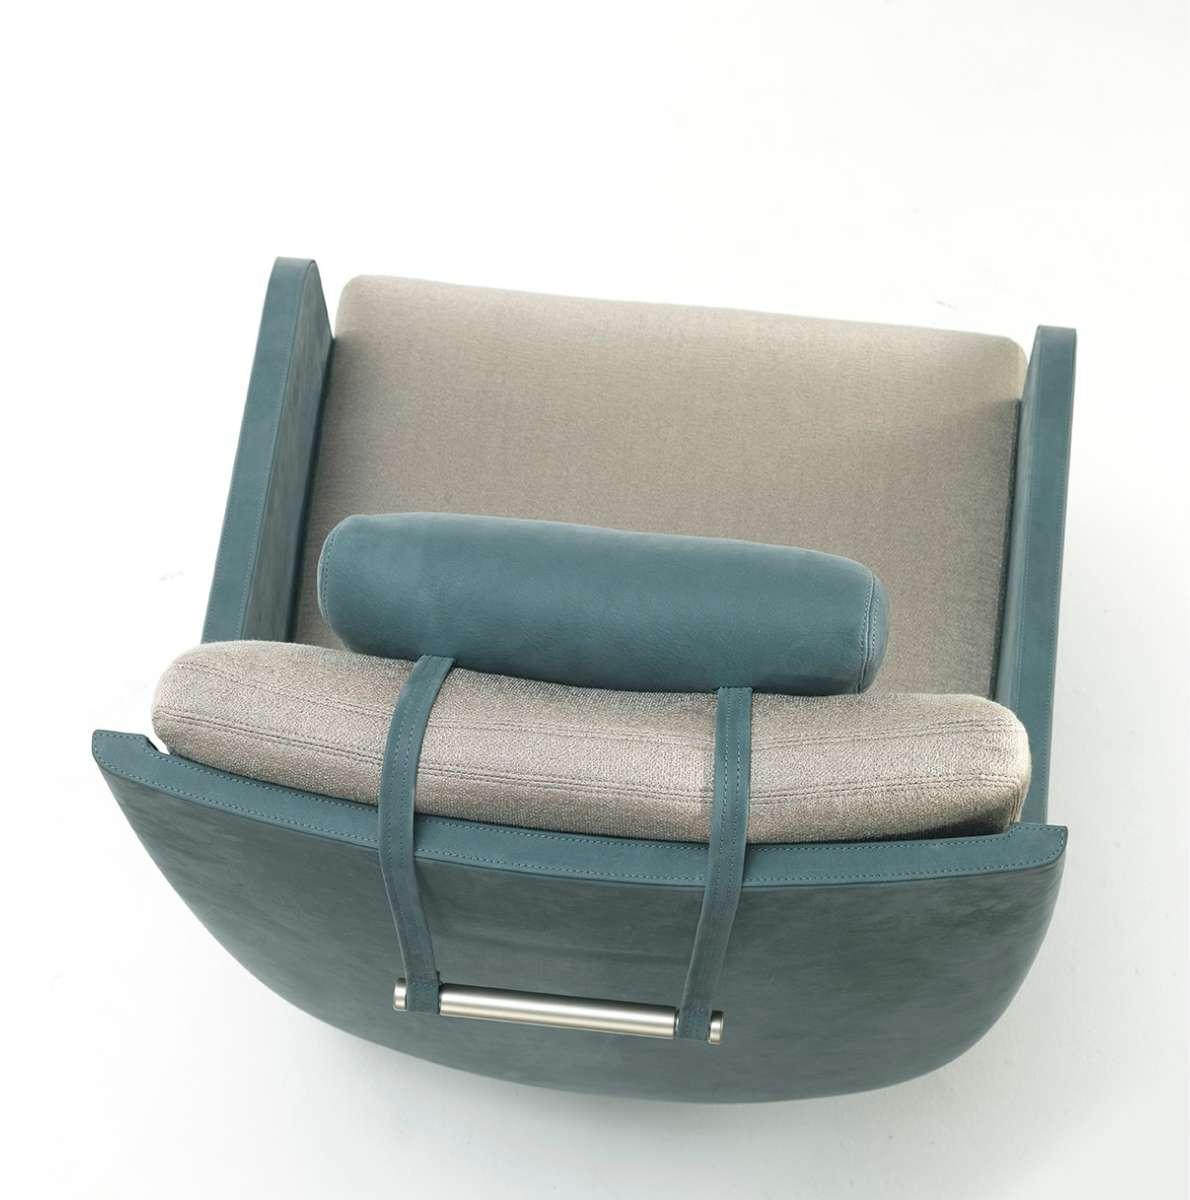 Studio Marco Piva – Product design – 420